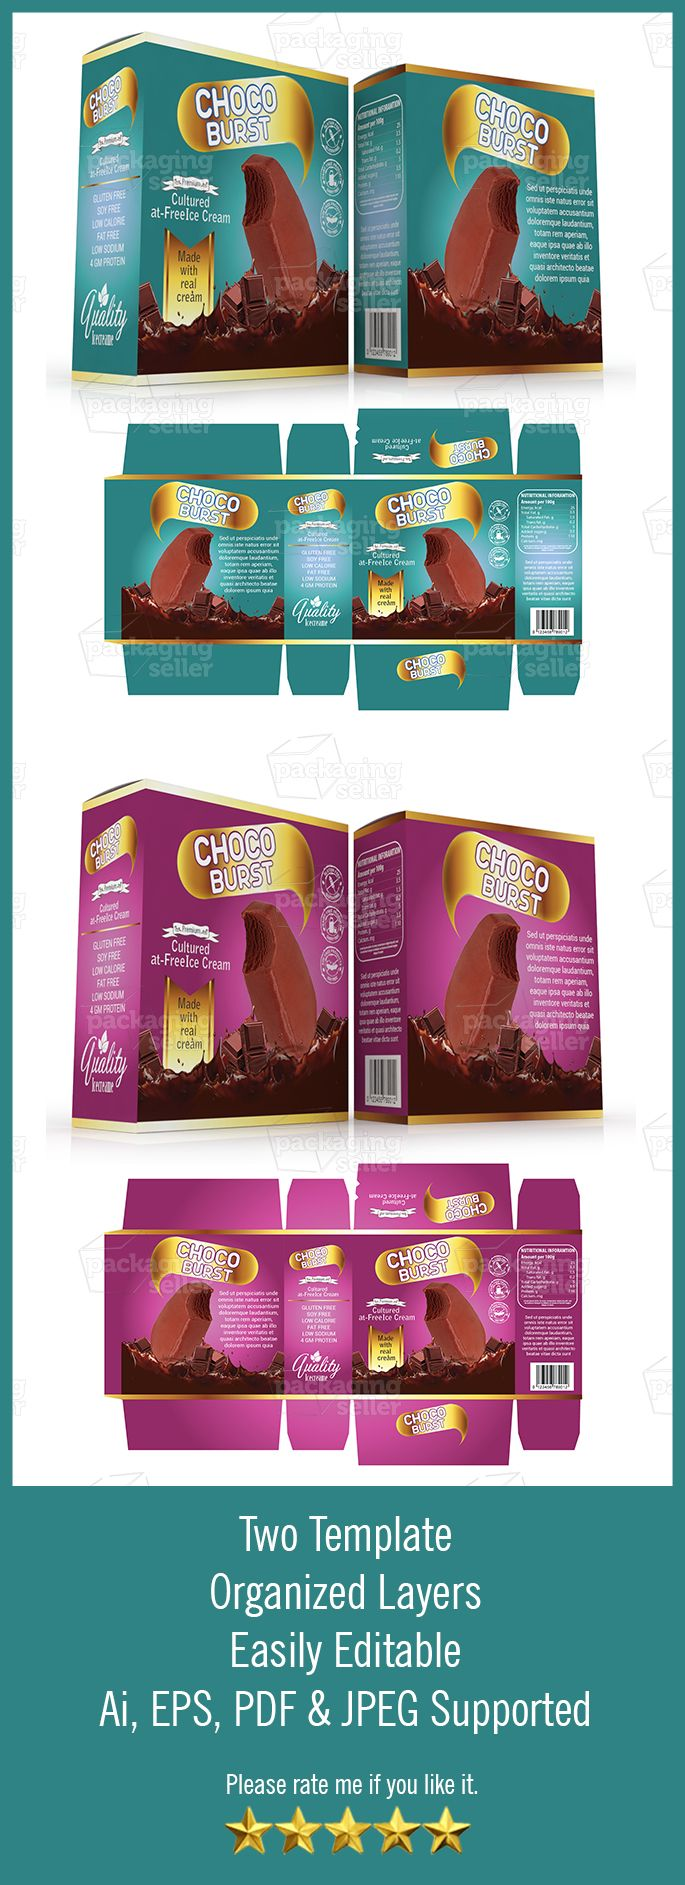 Ice Cream Packaging Template Vol 72 Packaging Seller Ice Cream Packaging Packaging Template Tea Box Design